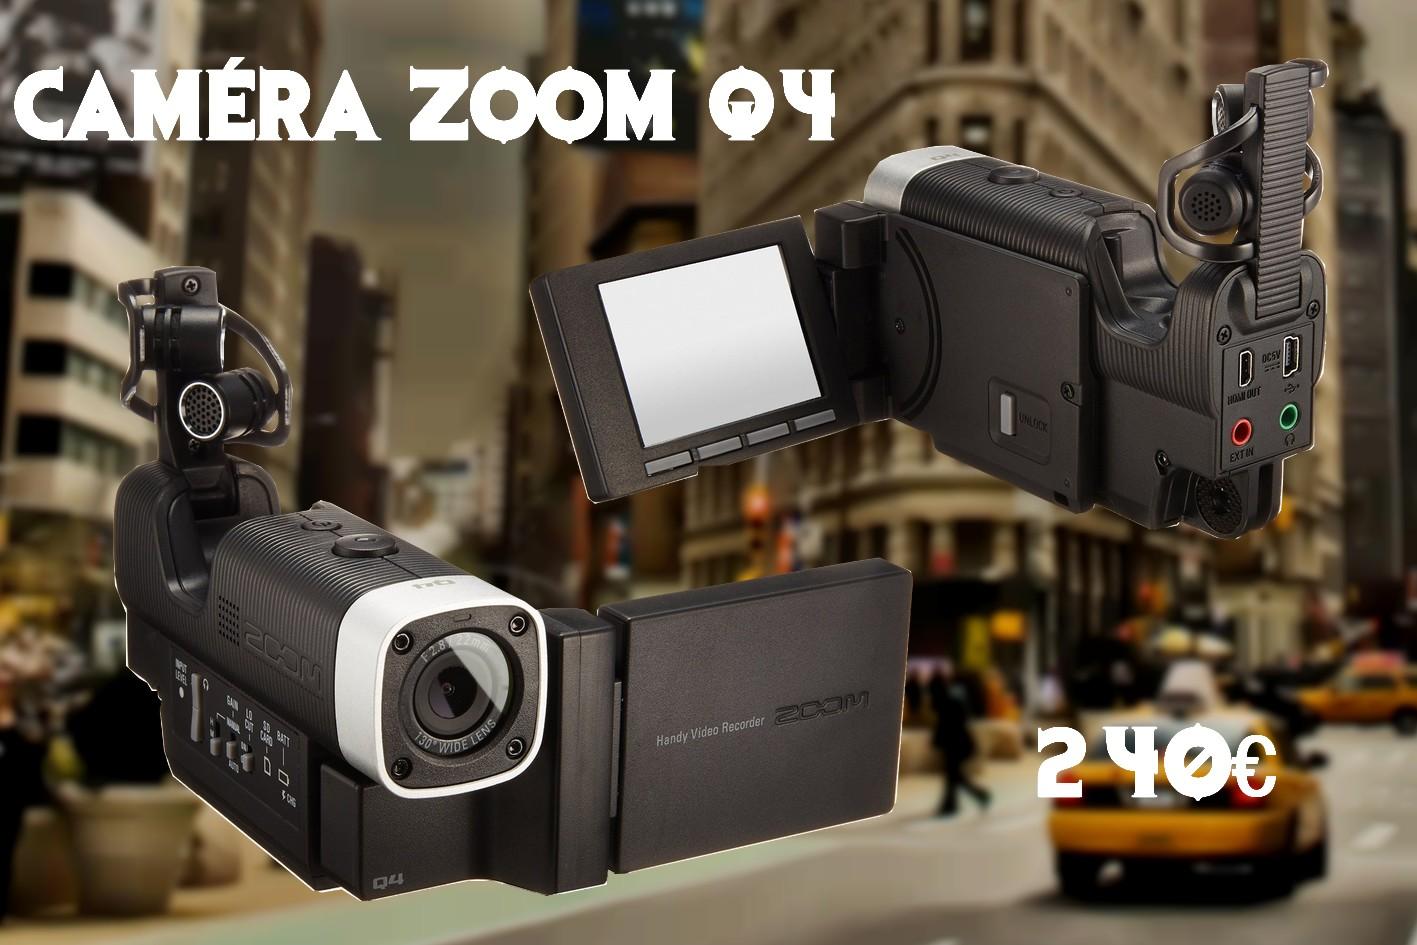 Bon plan camera vlog miniature zoom q4